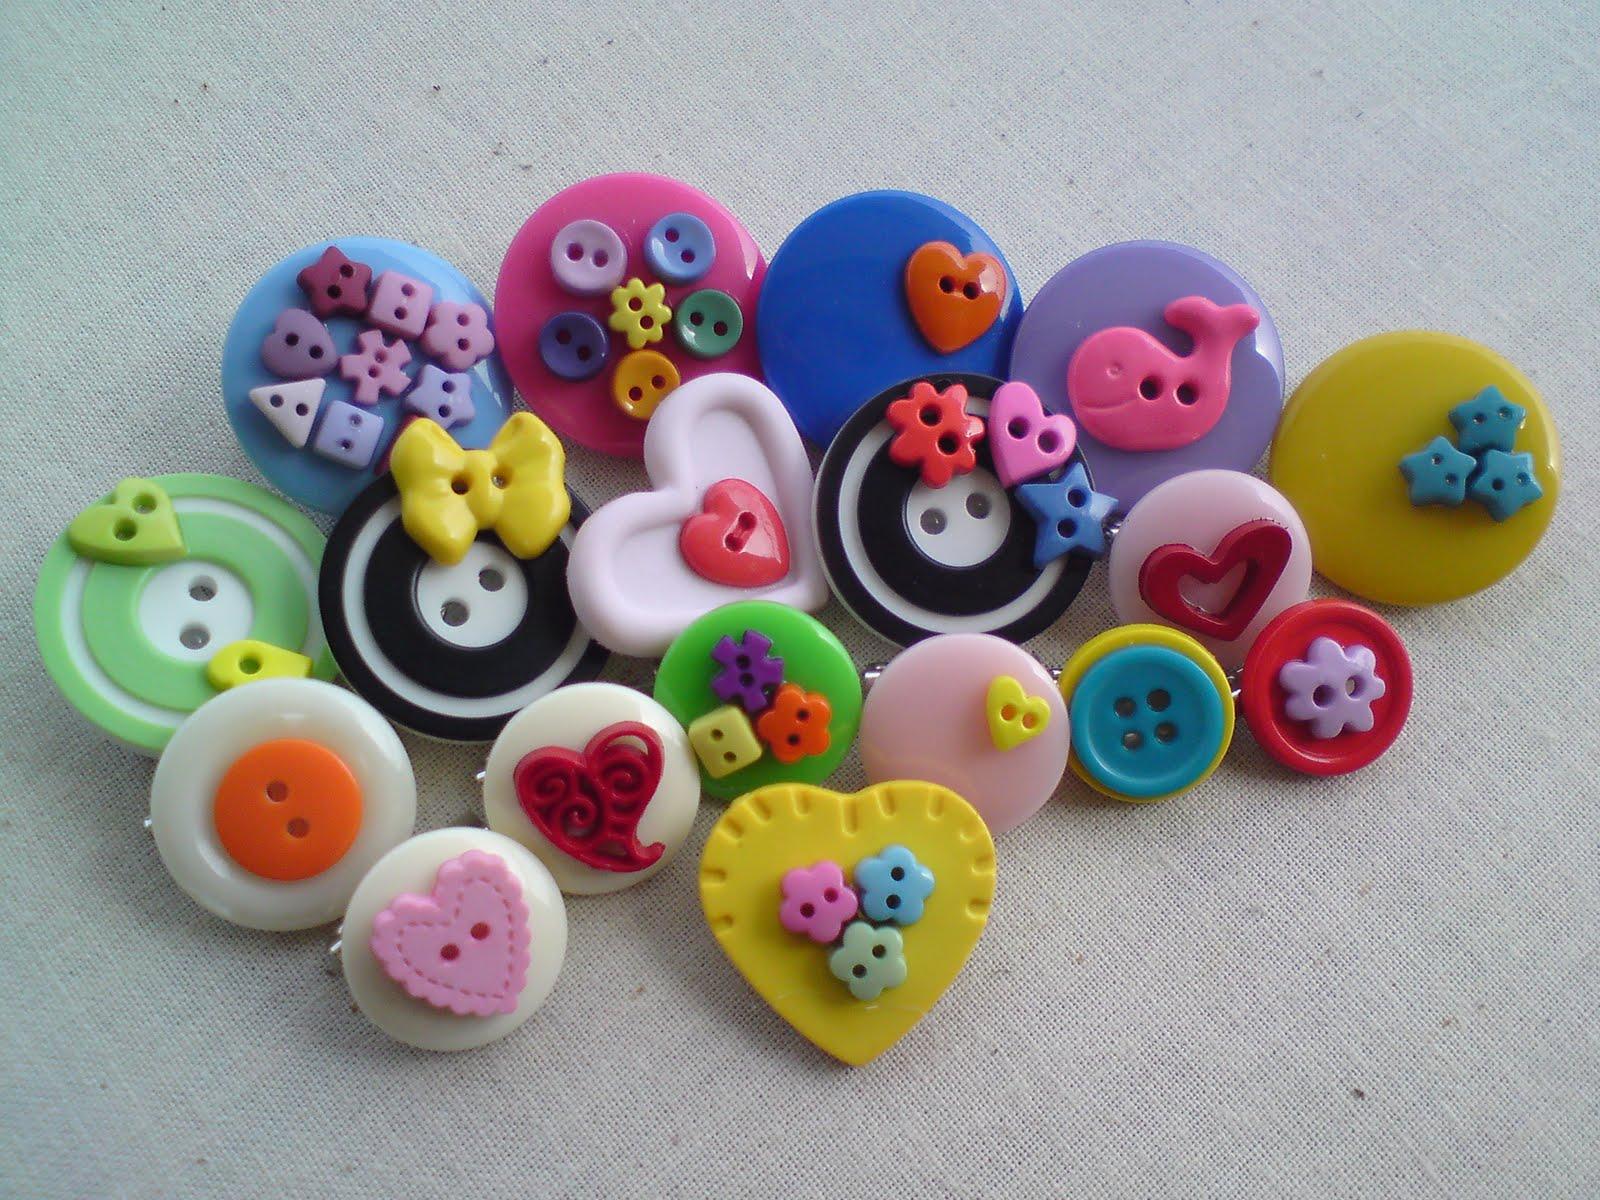 Ni adlh antara contoh2 button brooch yg tlh SUS siapkn Amat mudah n